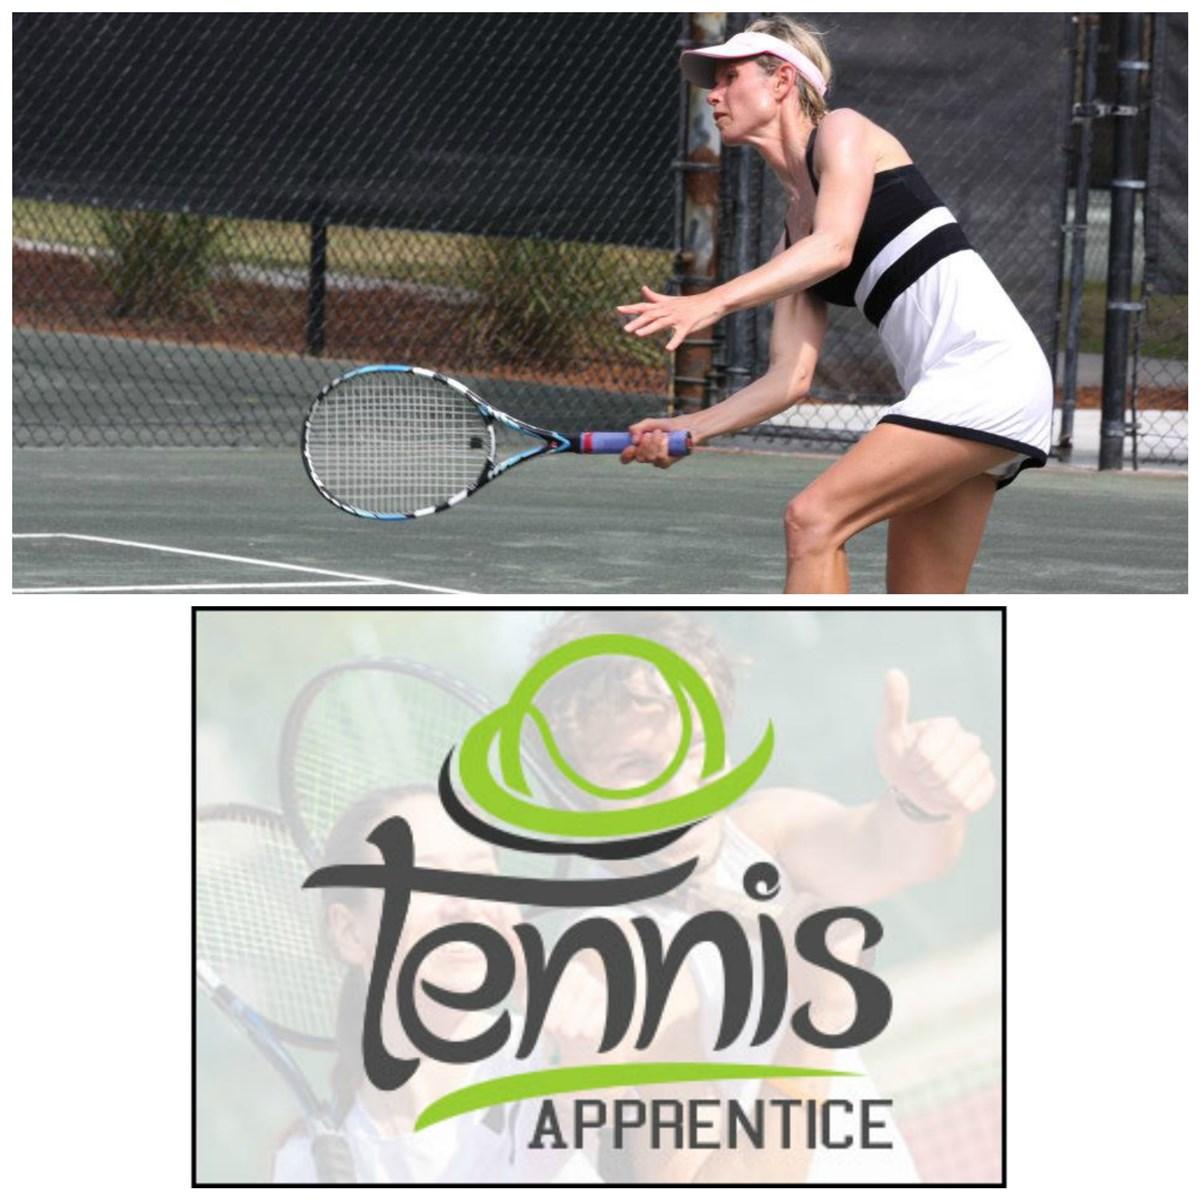 Alyssa_Tennis_Apprentice